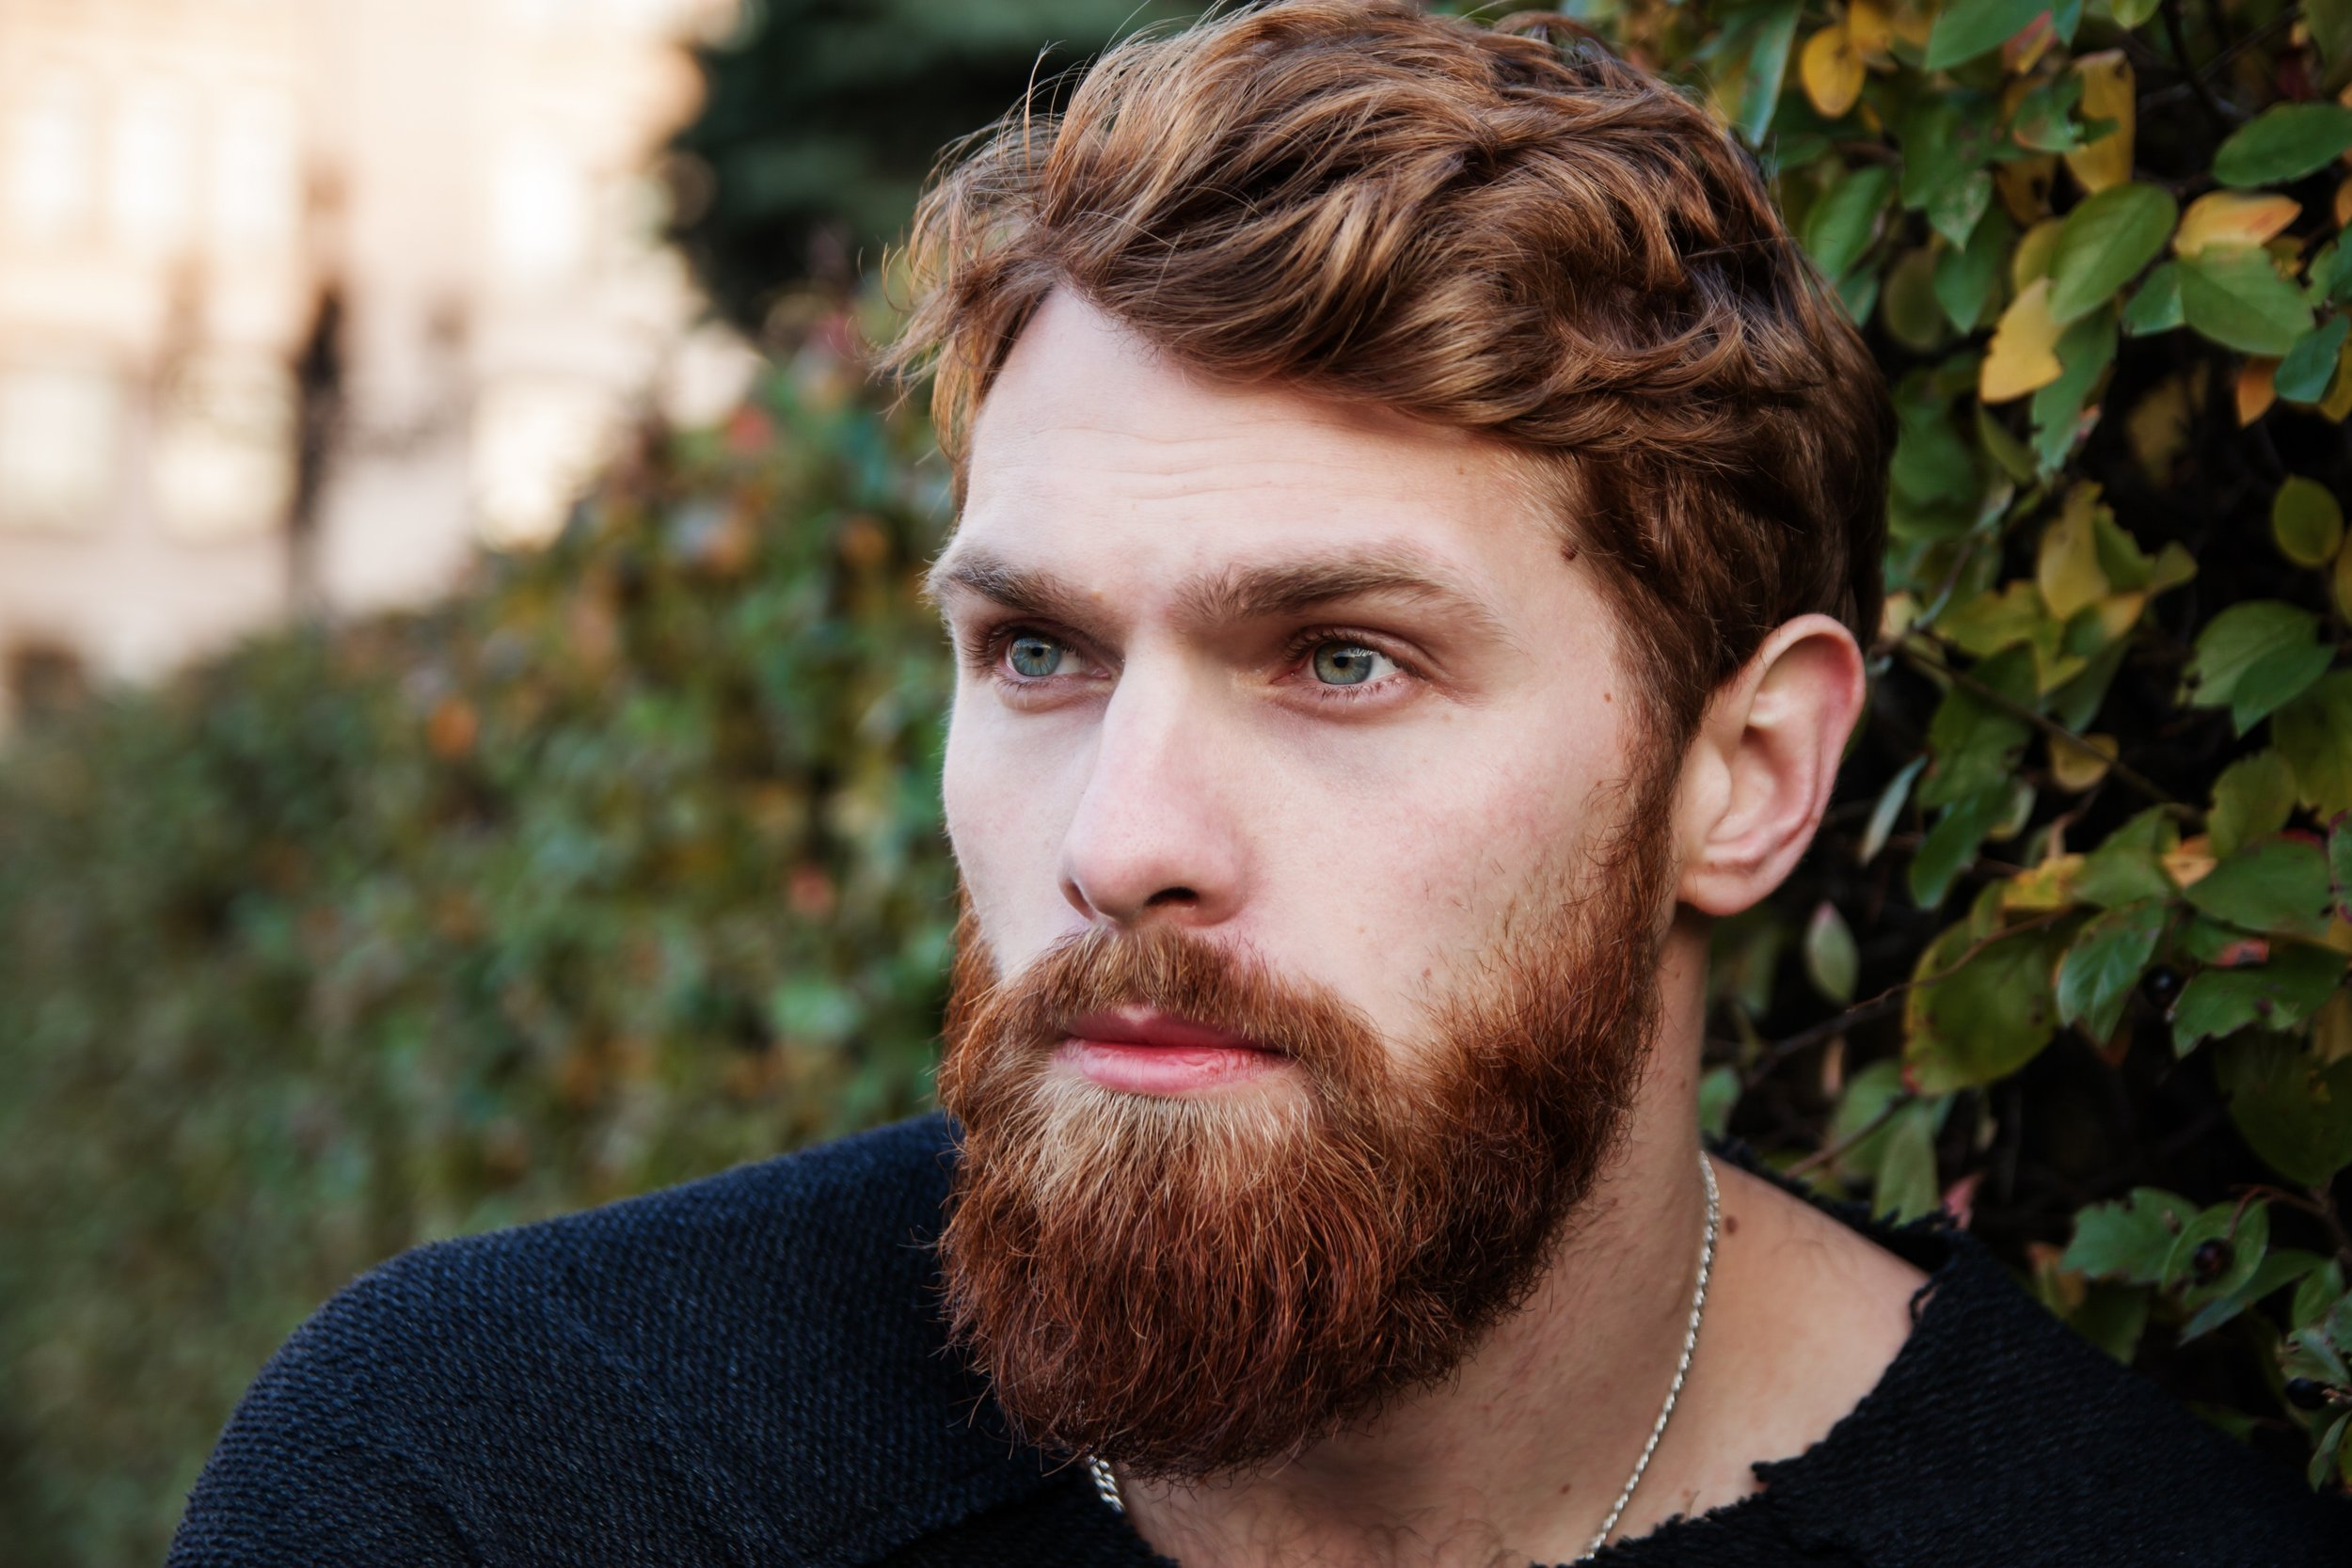 adult-attractive-beard-247885.jpg